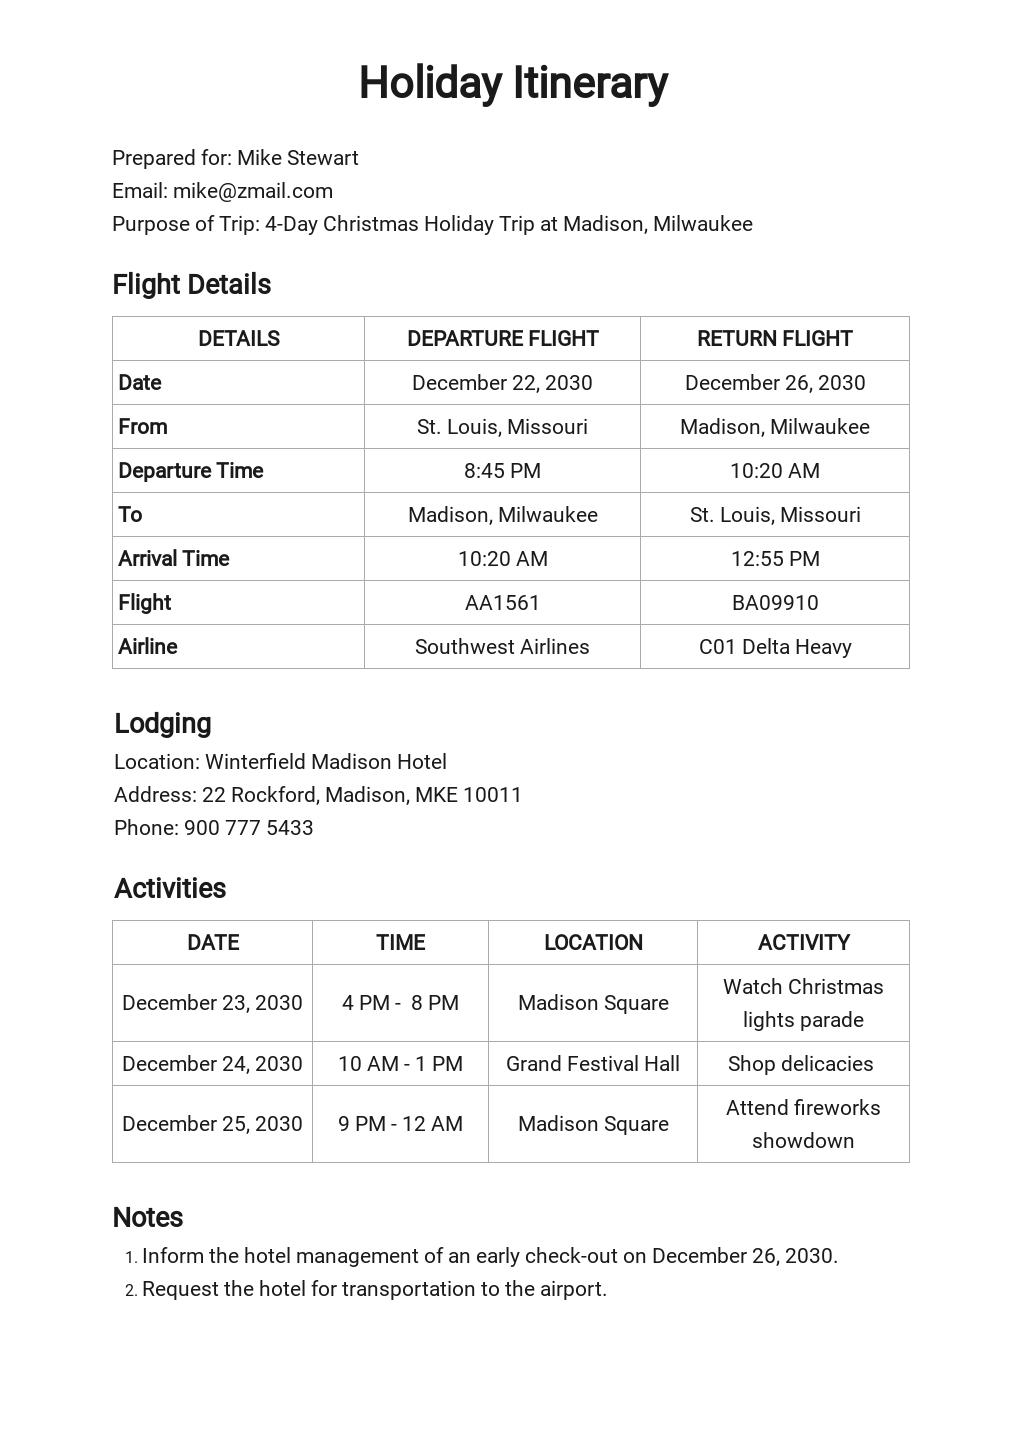 Free Holiday Itinerary Template.jpe